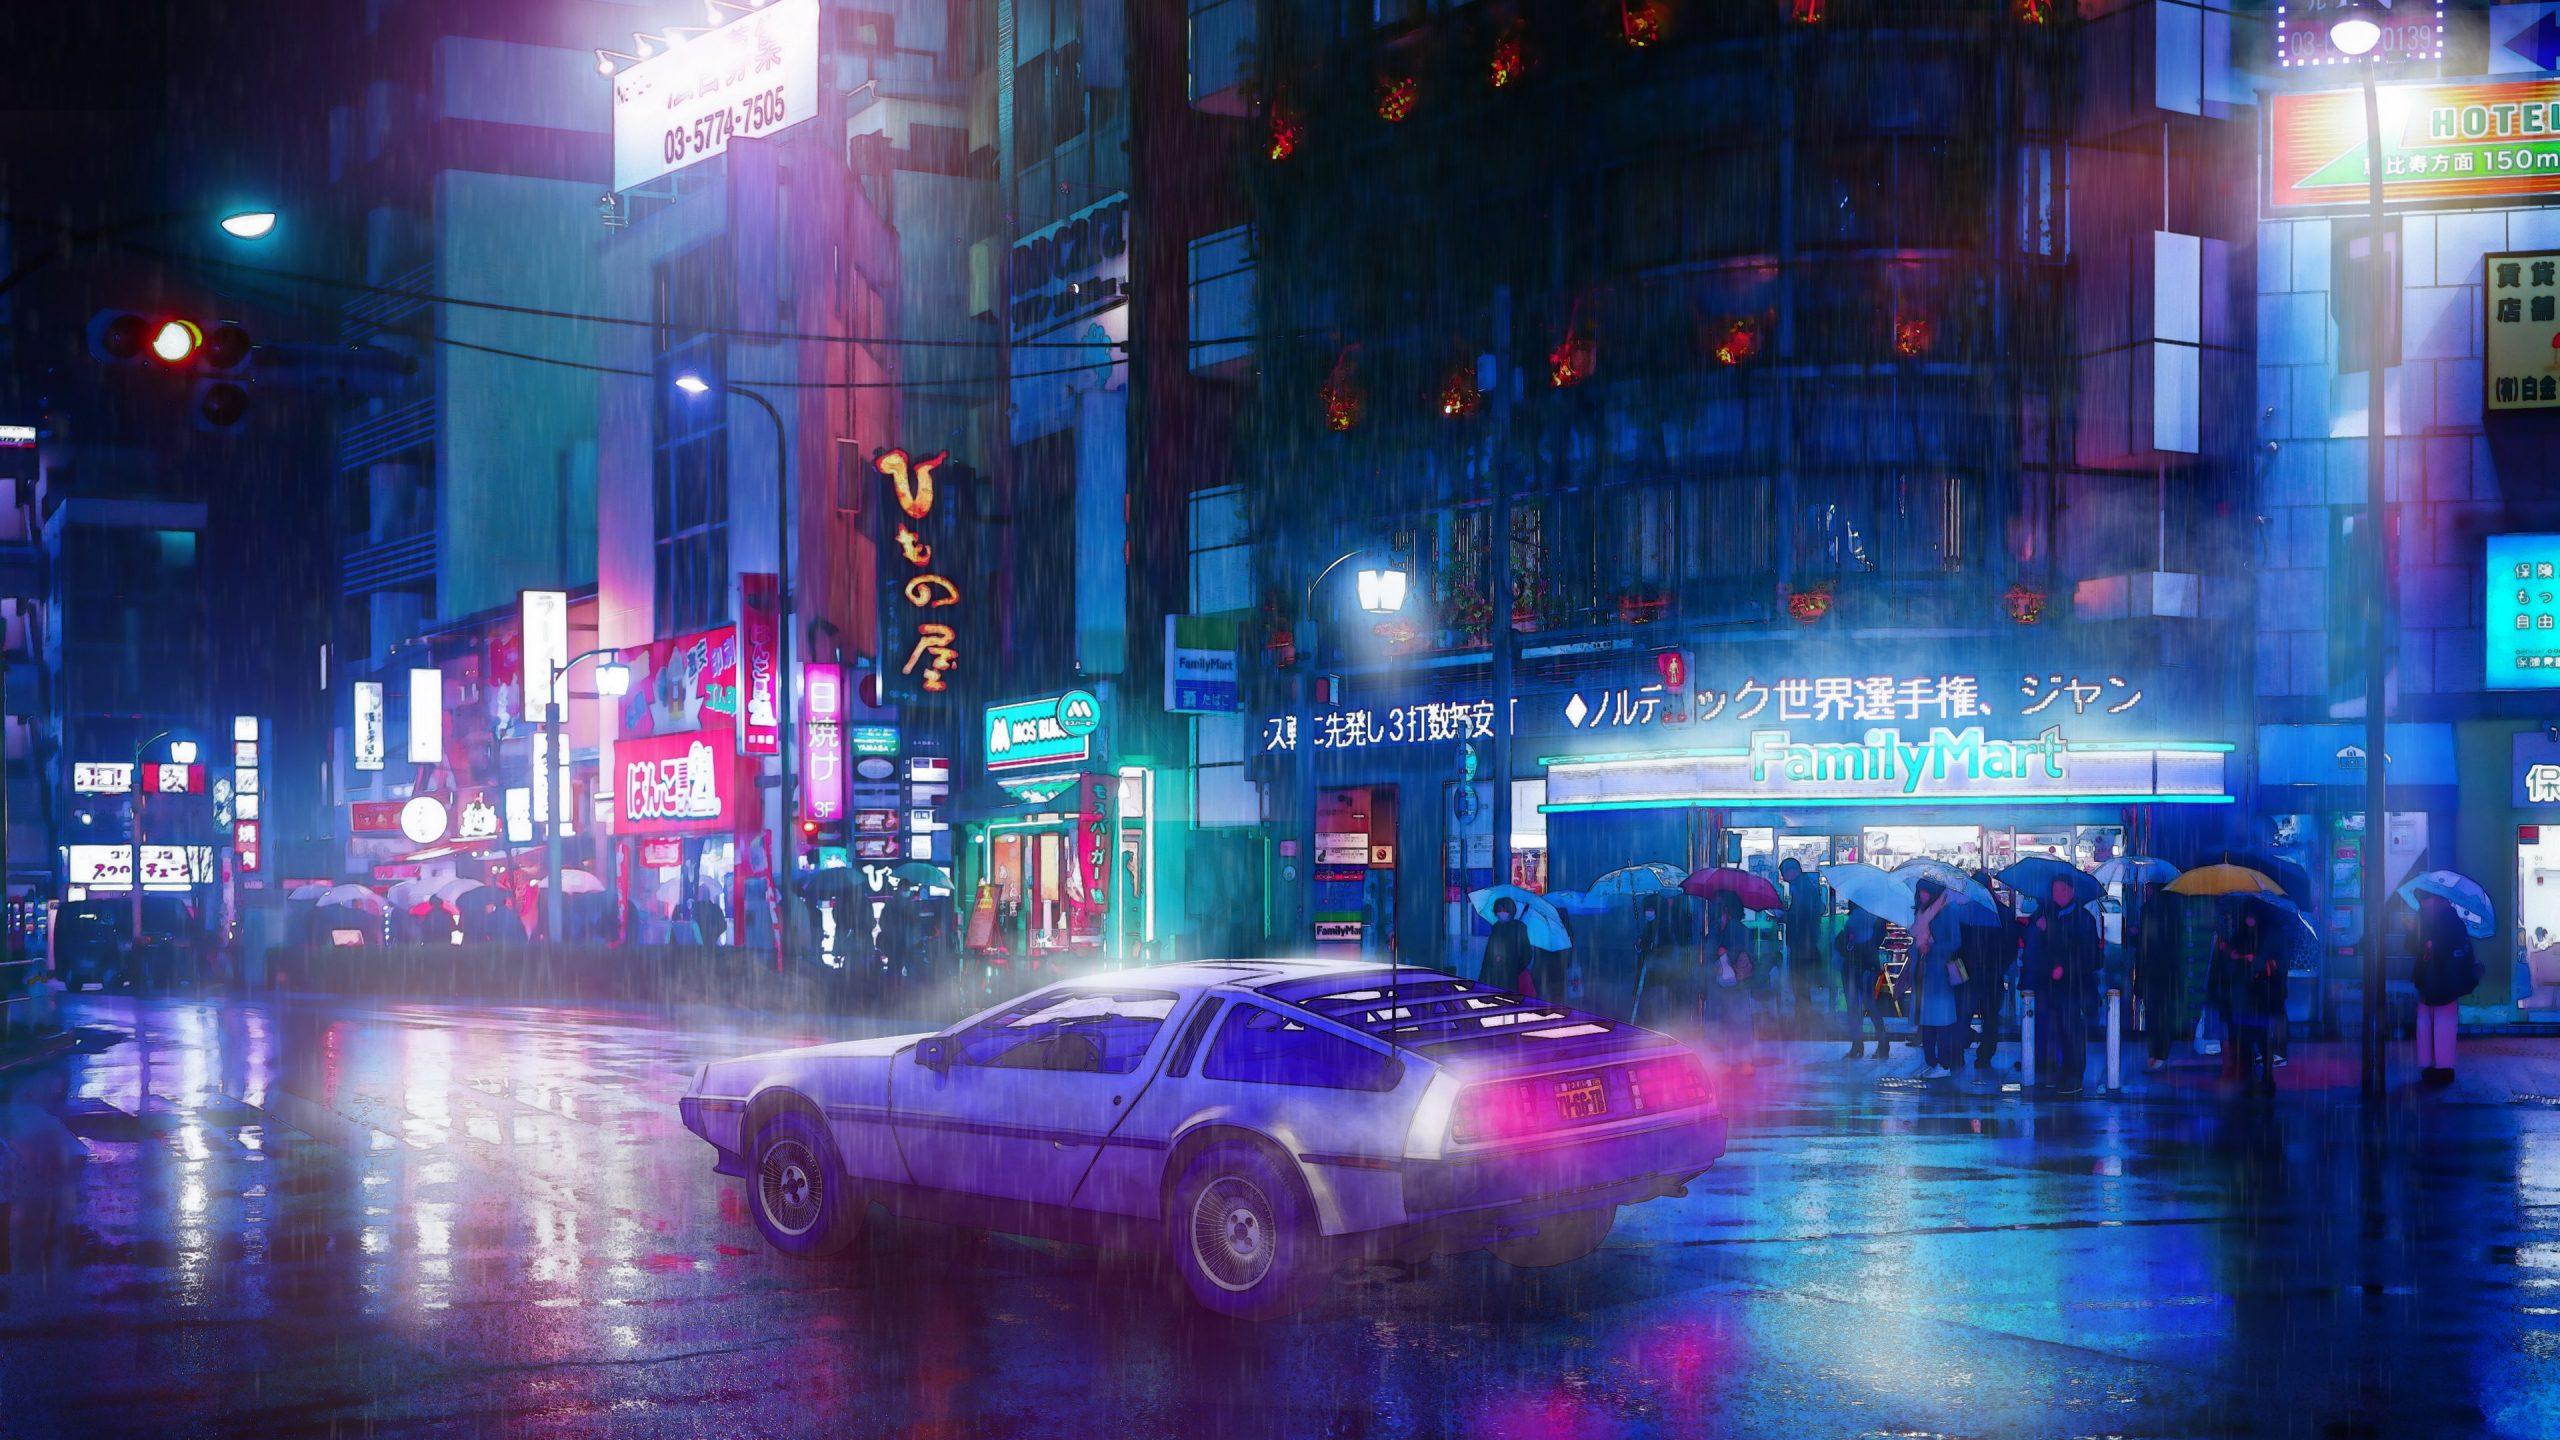 cyberpunk 2077 ce siberpunk teama